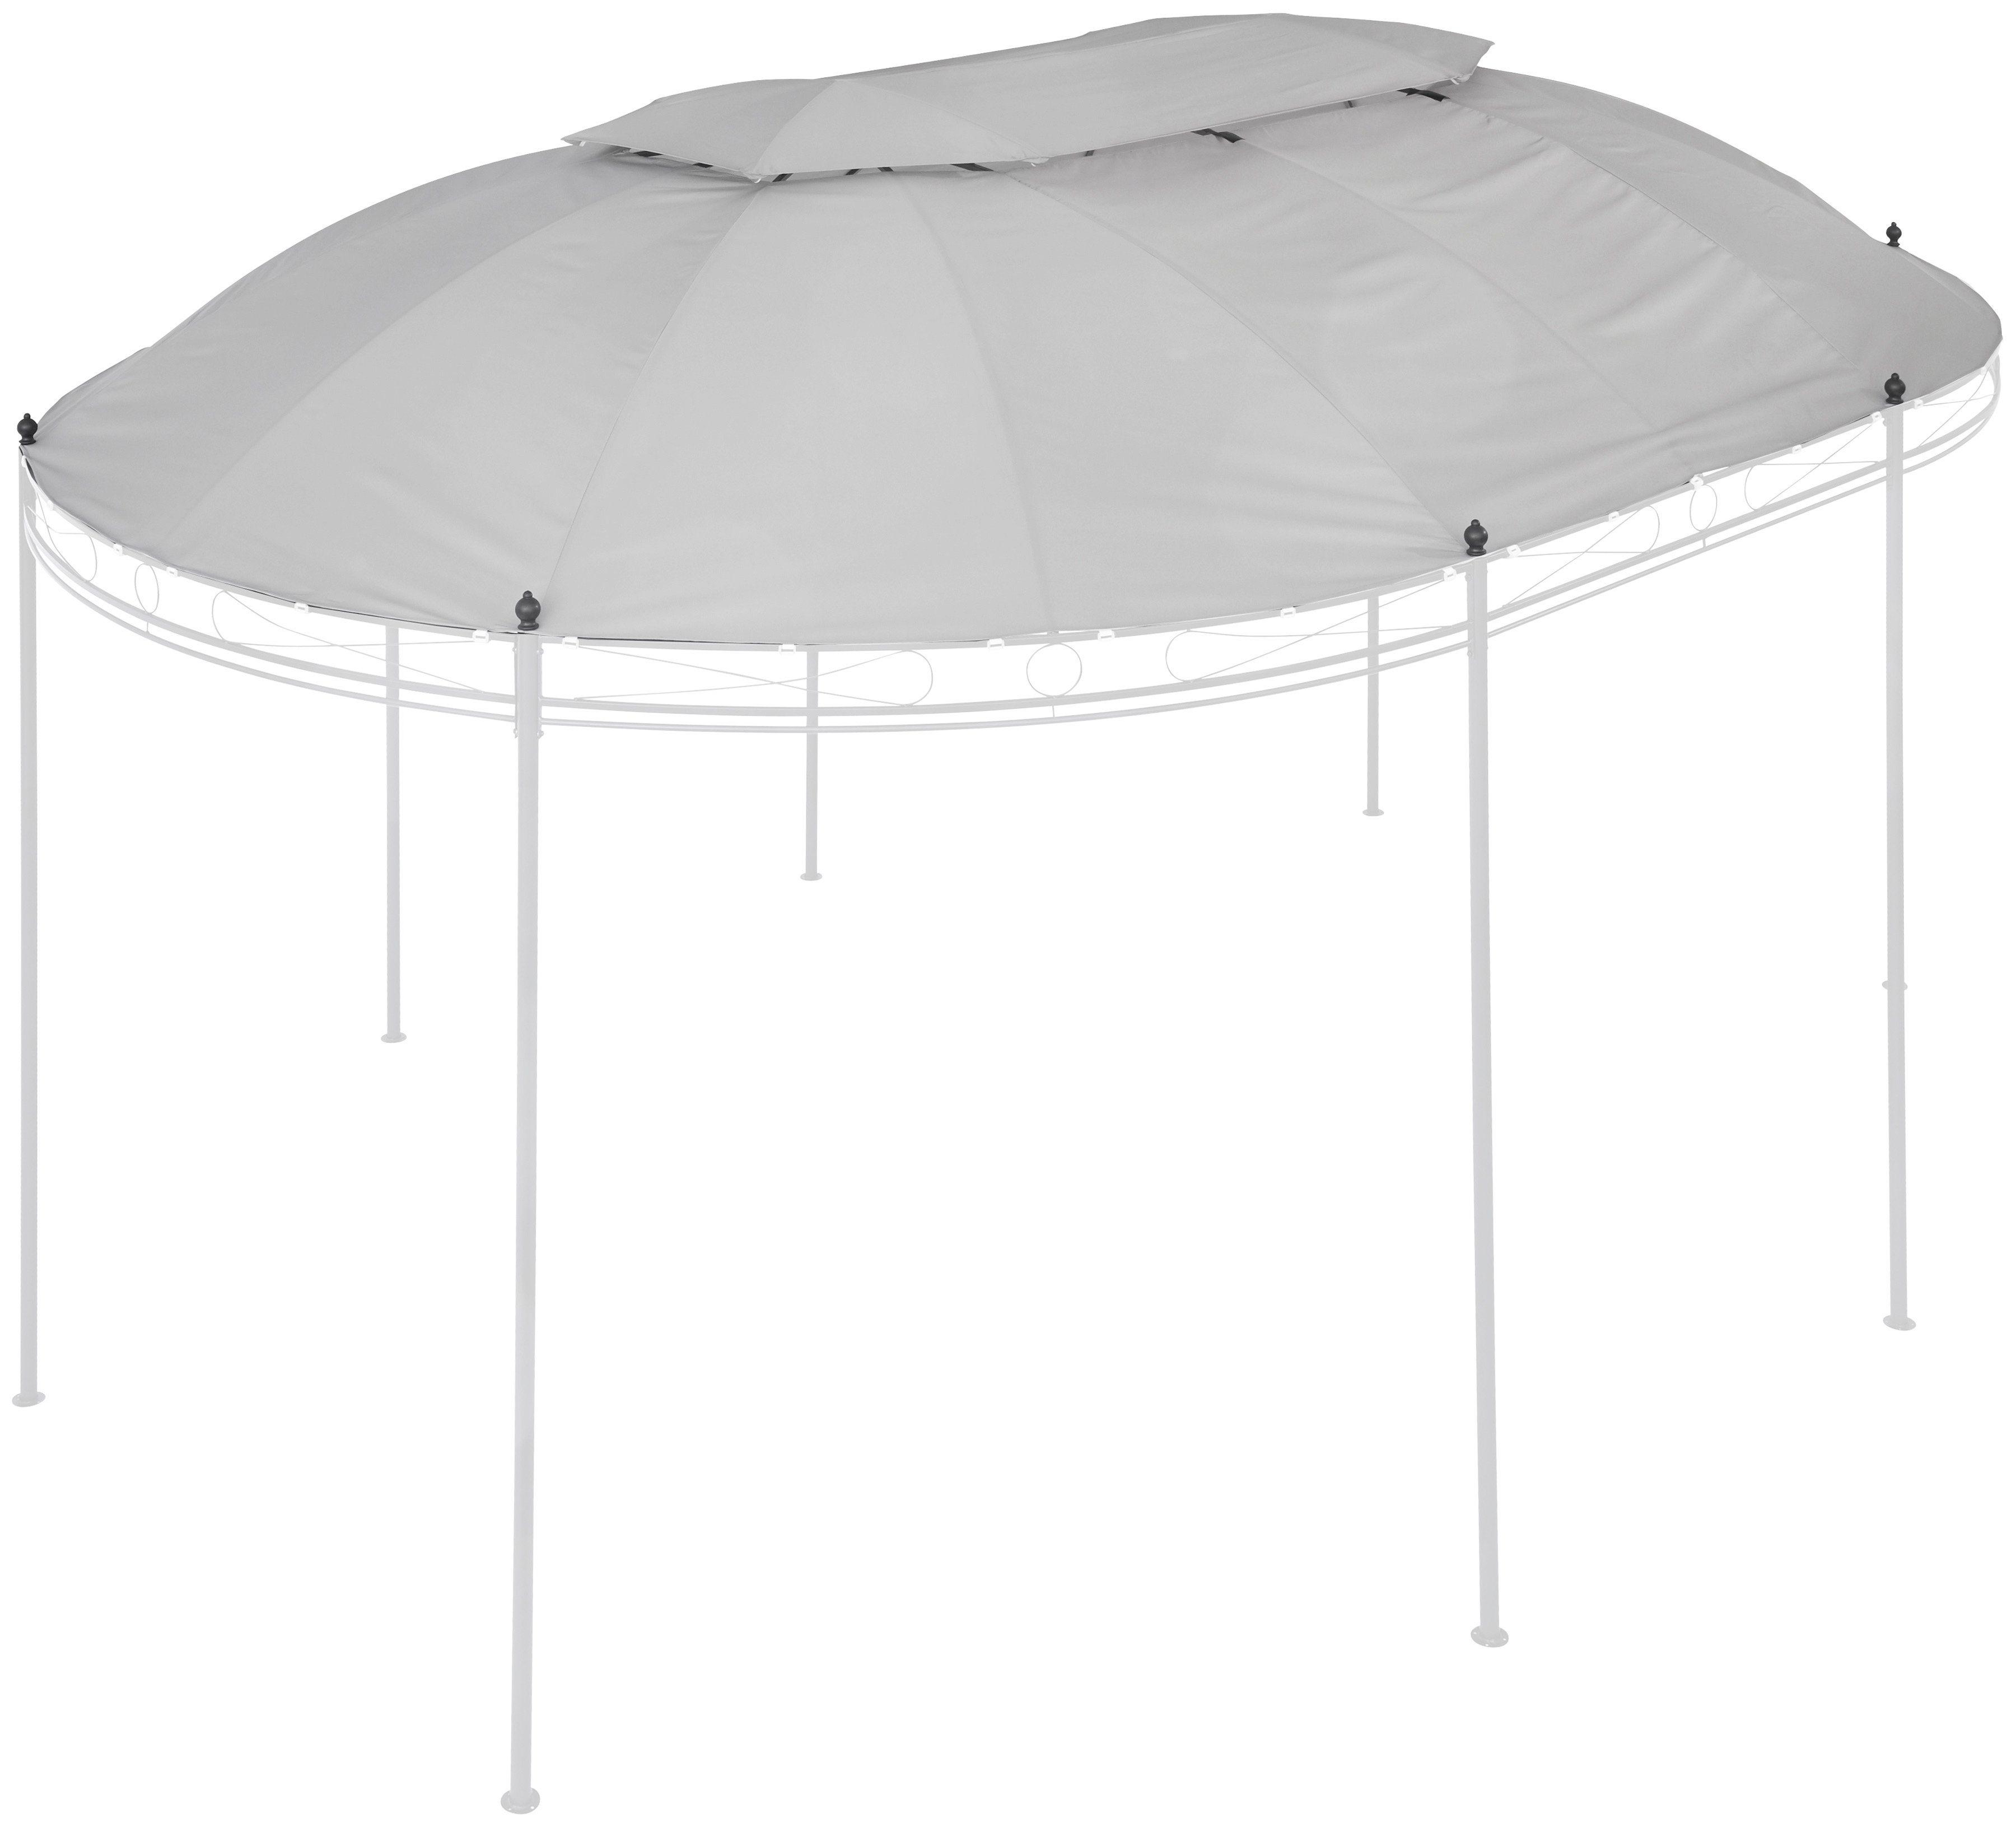 Ersatzdach für Pavillon »Oval«, BxL: 350x500 cm, grau   Garten > Pavillons   Polyester